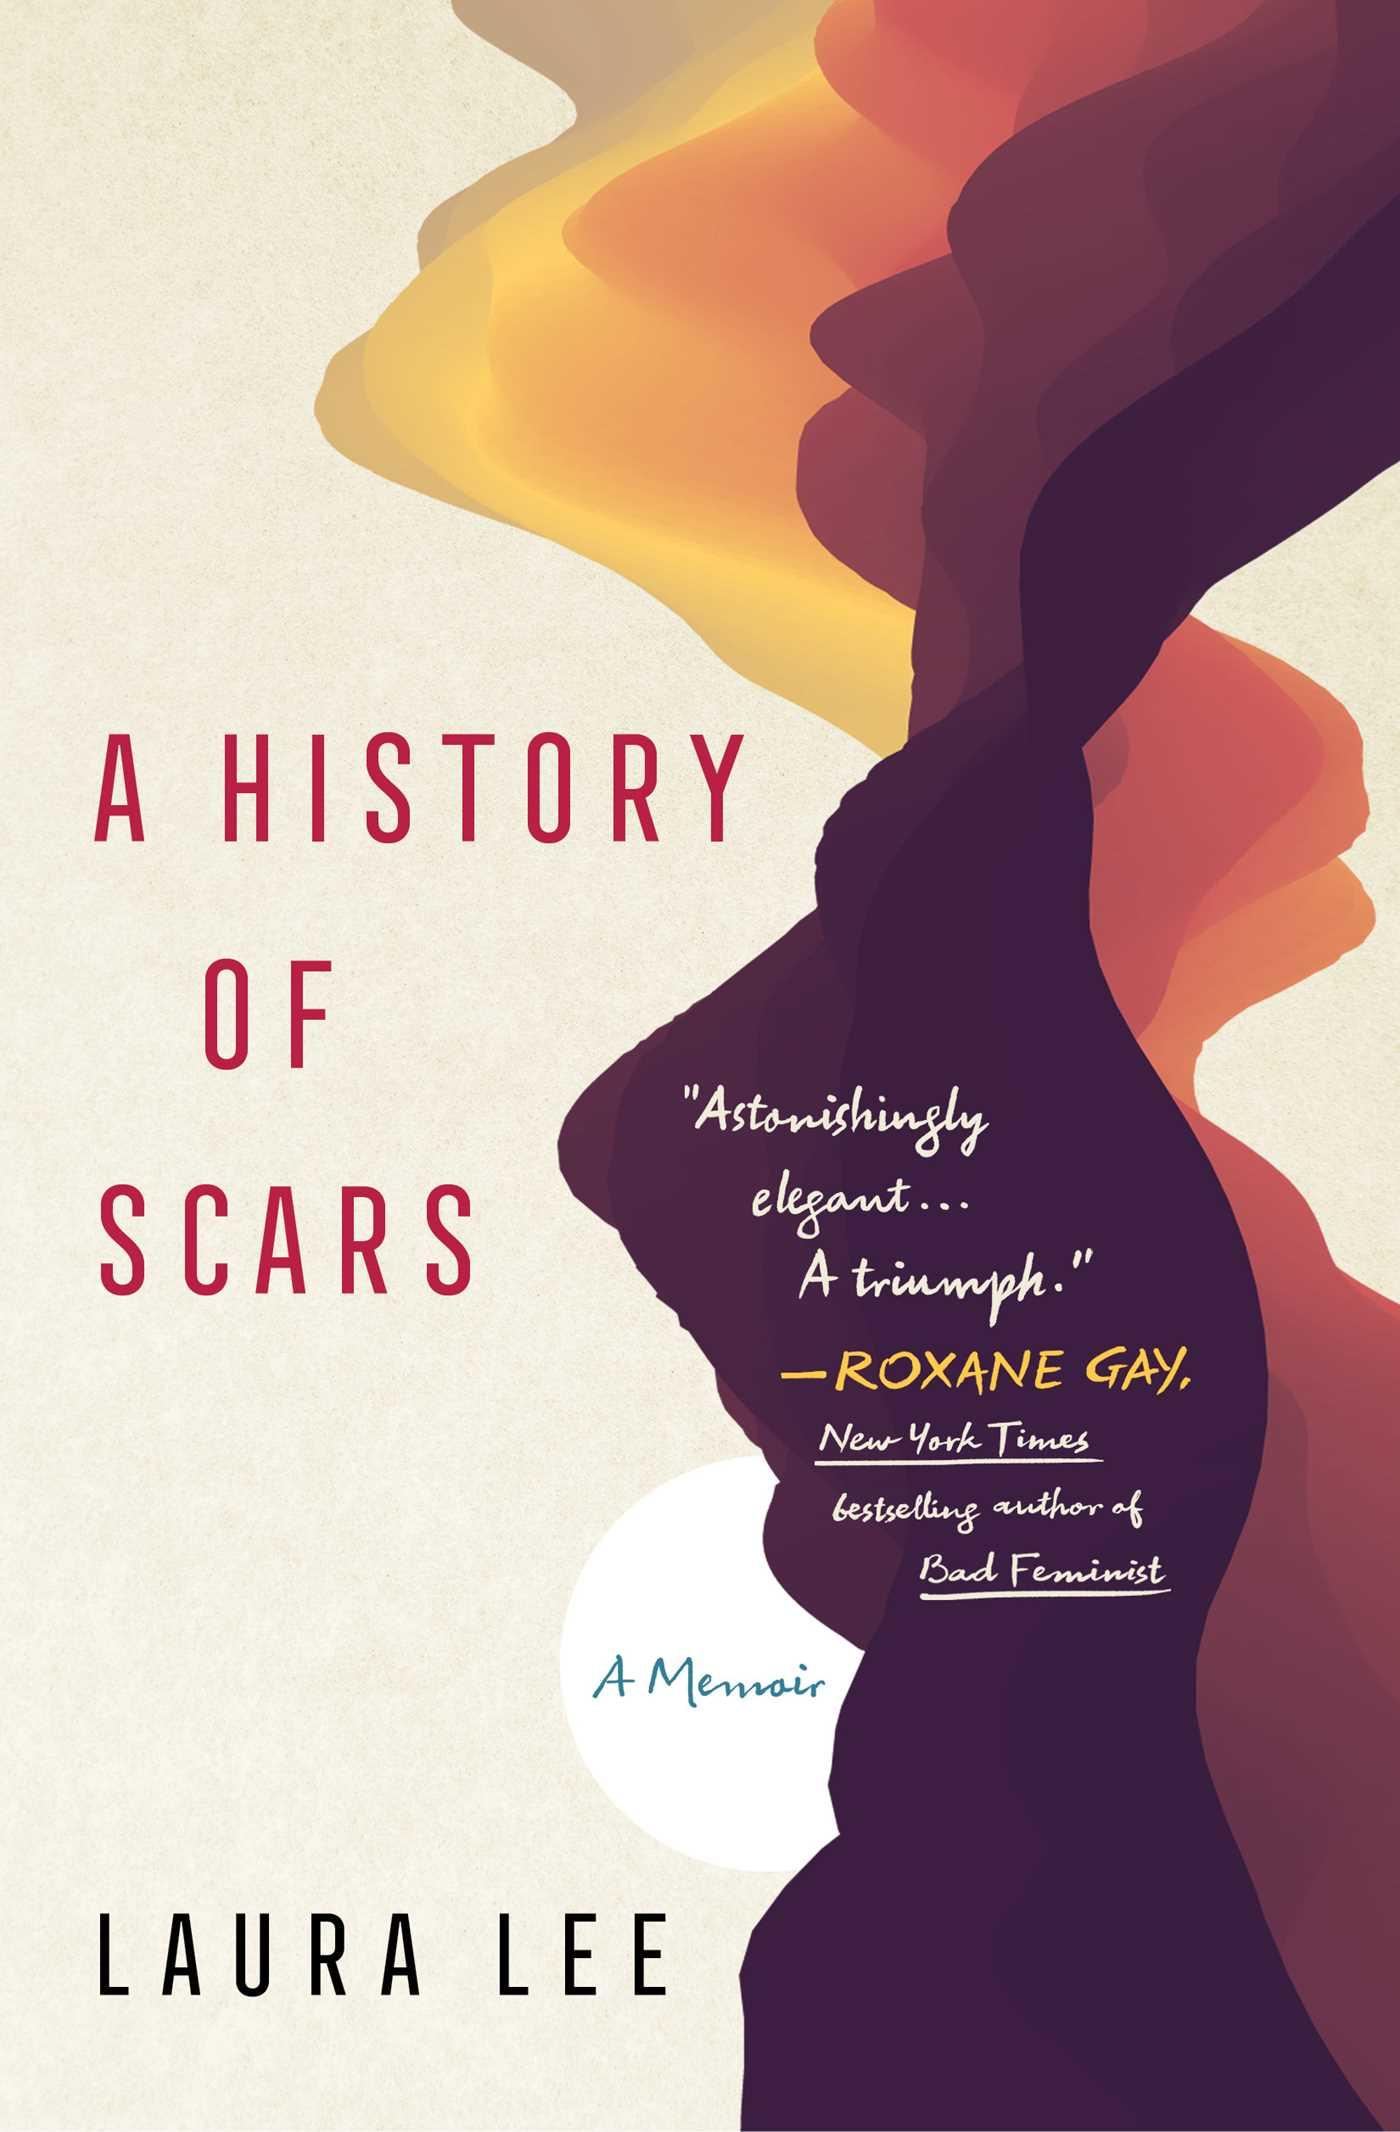 A History of Scars: A Memoir